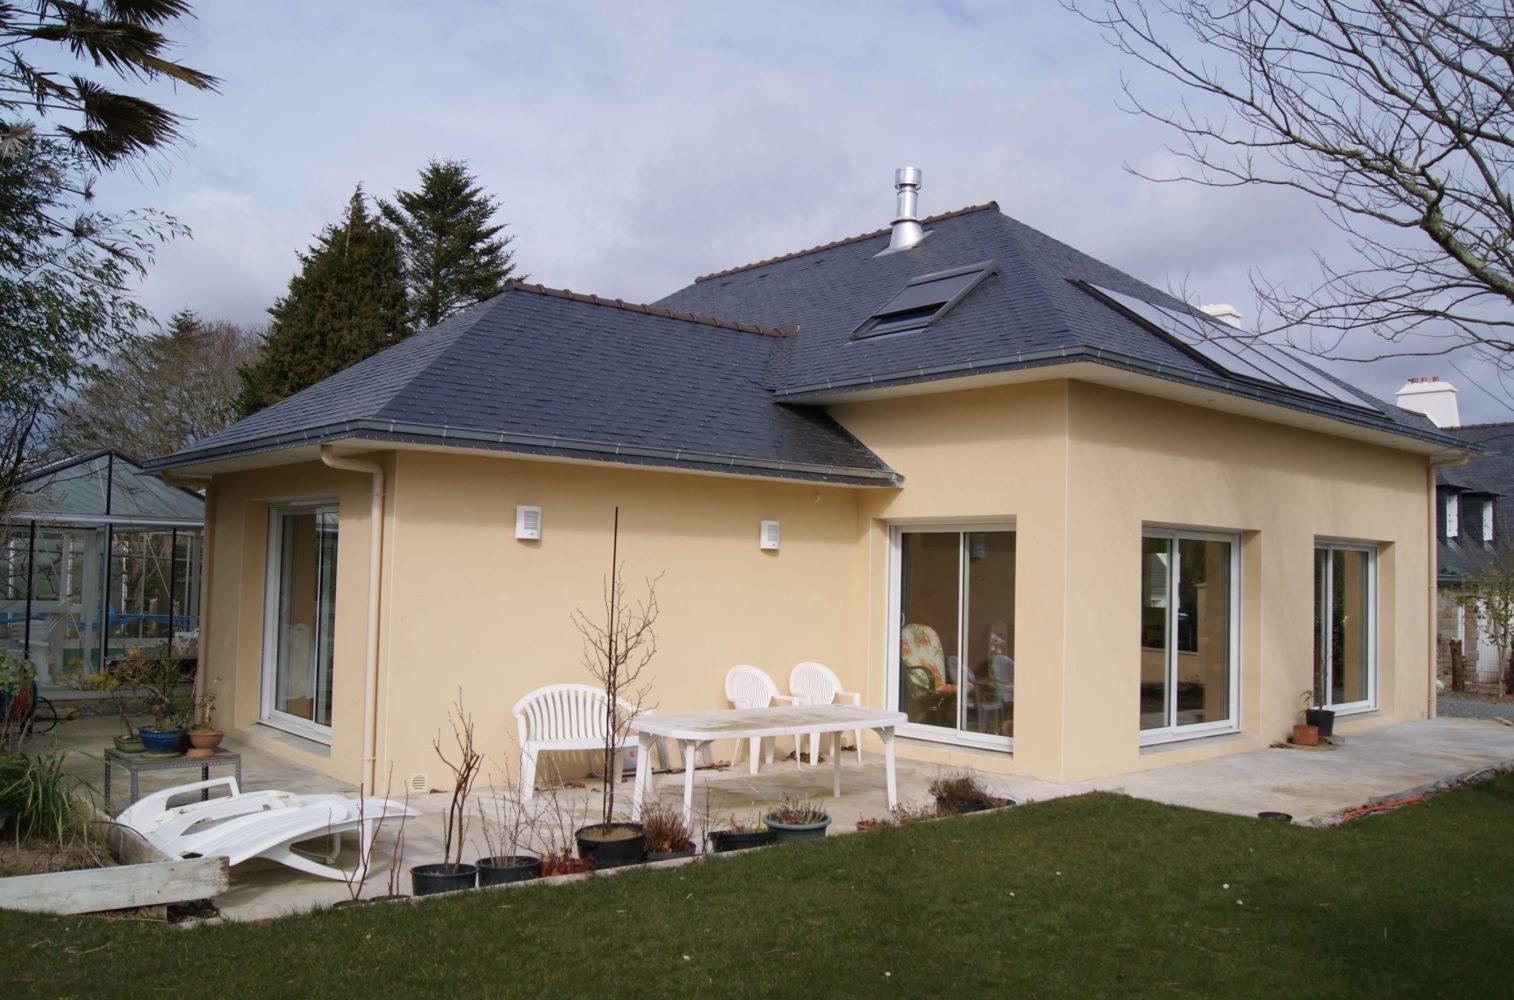 constructeur maison neuve brest ventana blog. Black Bedroom Furniture Sets. Home Design Ideas